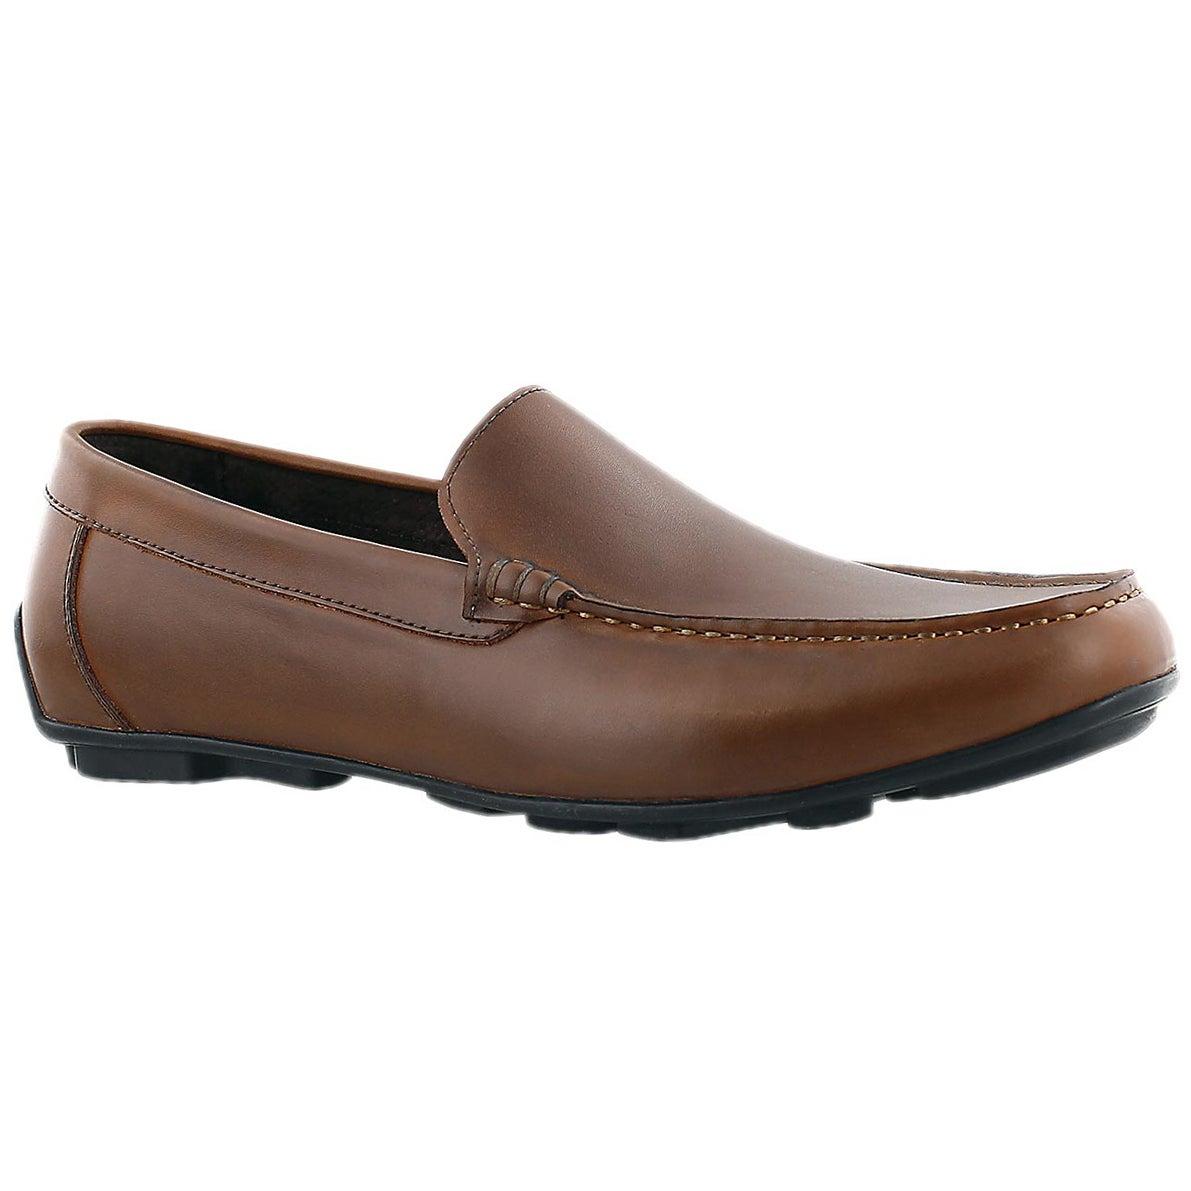 Mns Josh cognac slip on dress loafer